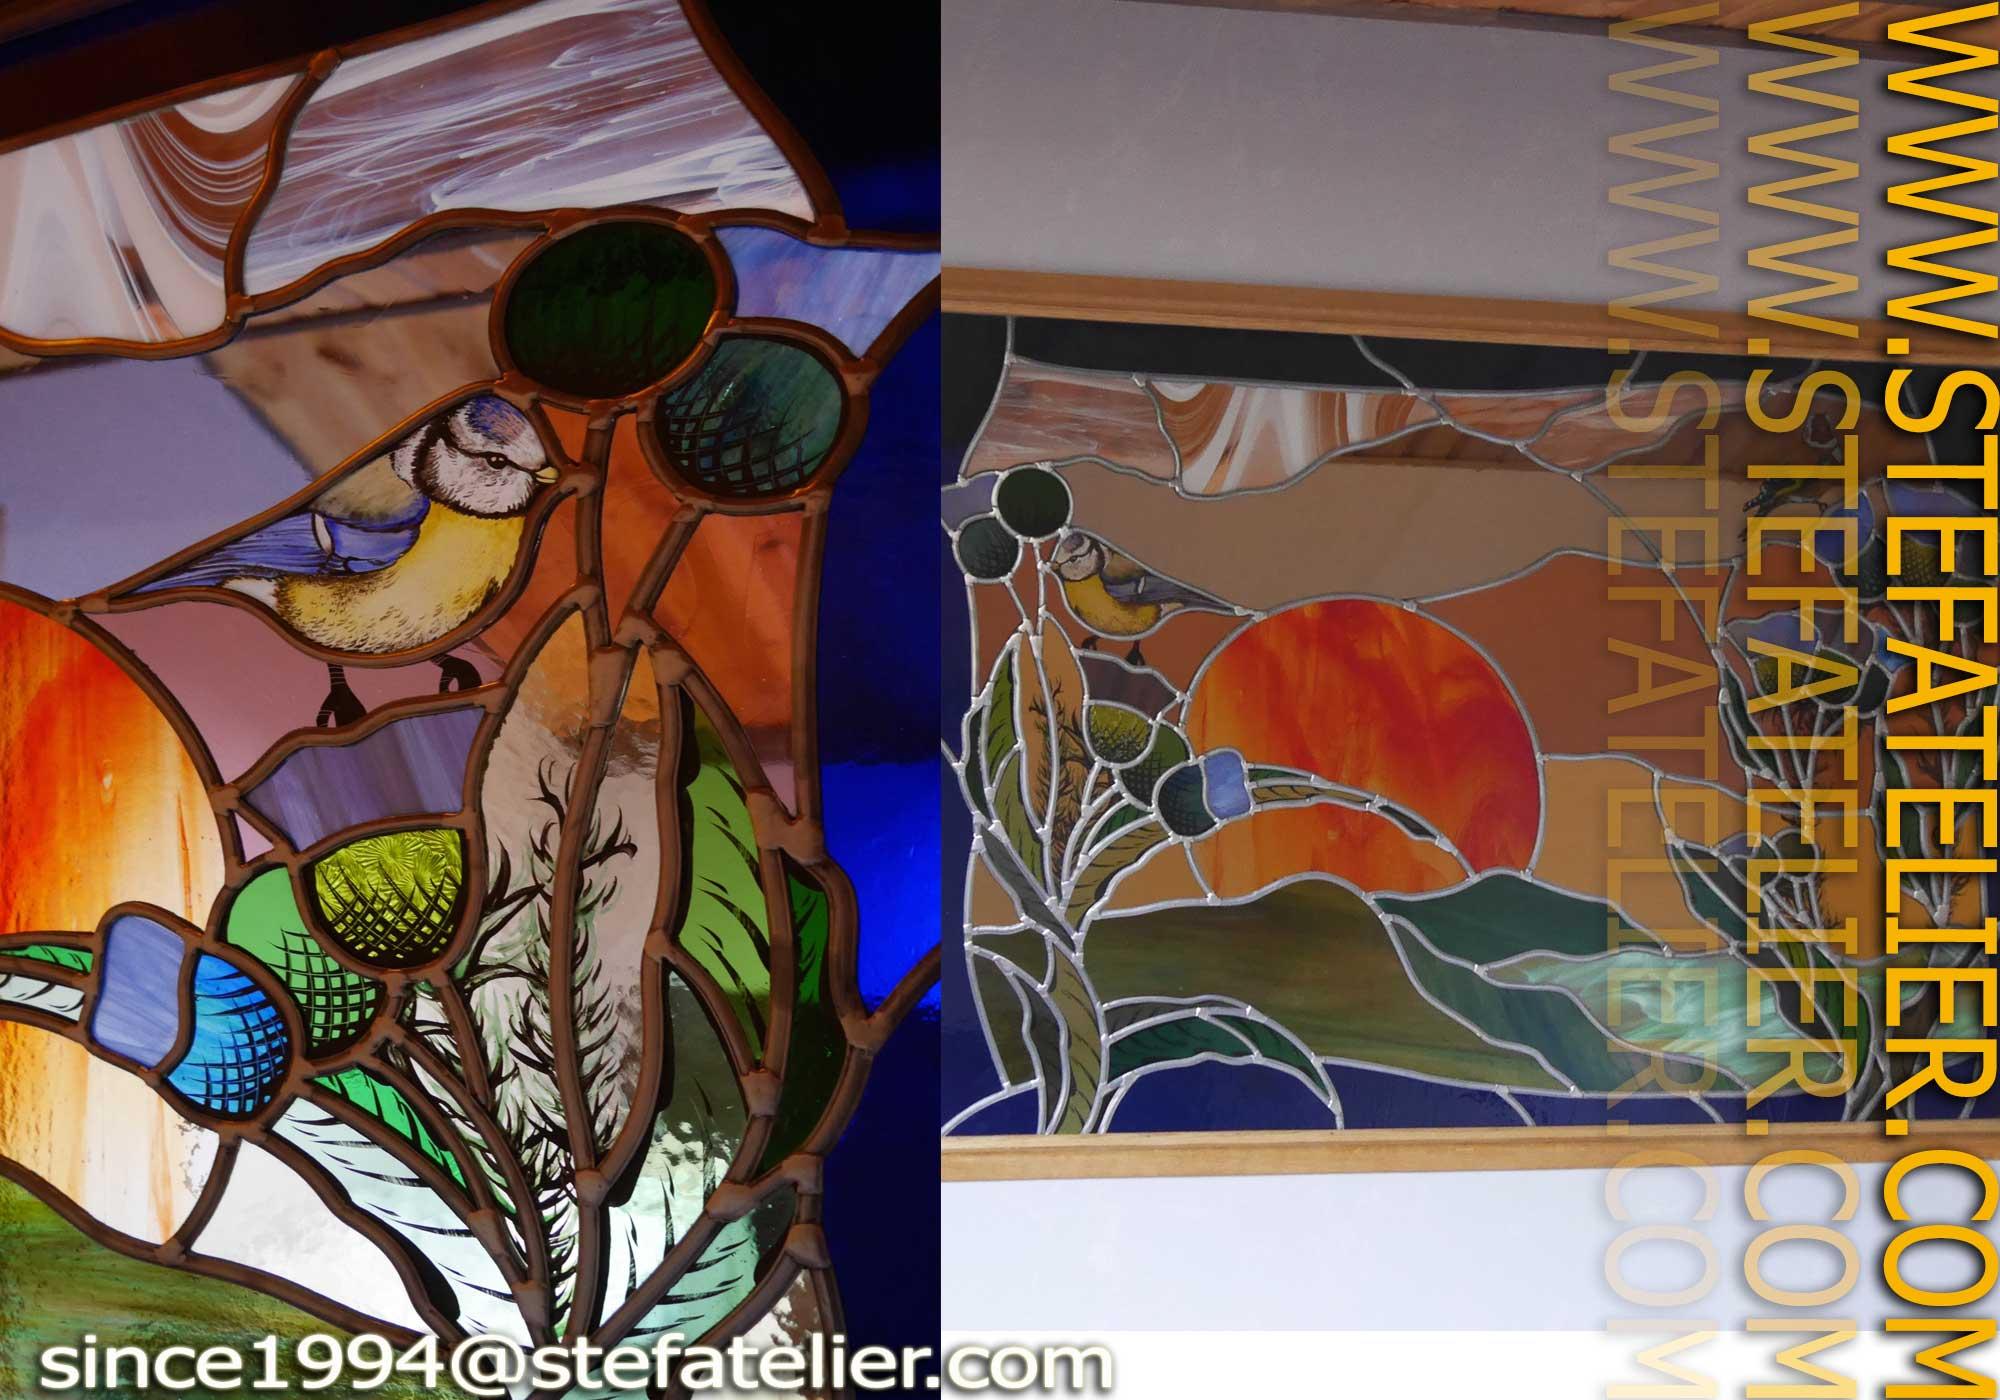 vitrail chardons stef atelier vitraux d art. Black Bedroom Furniture Sets. Home Design Ideas